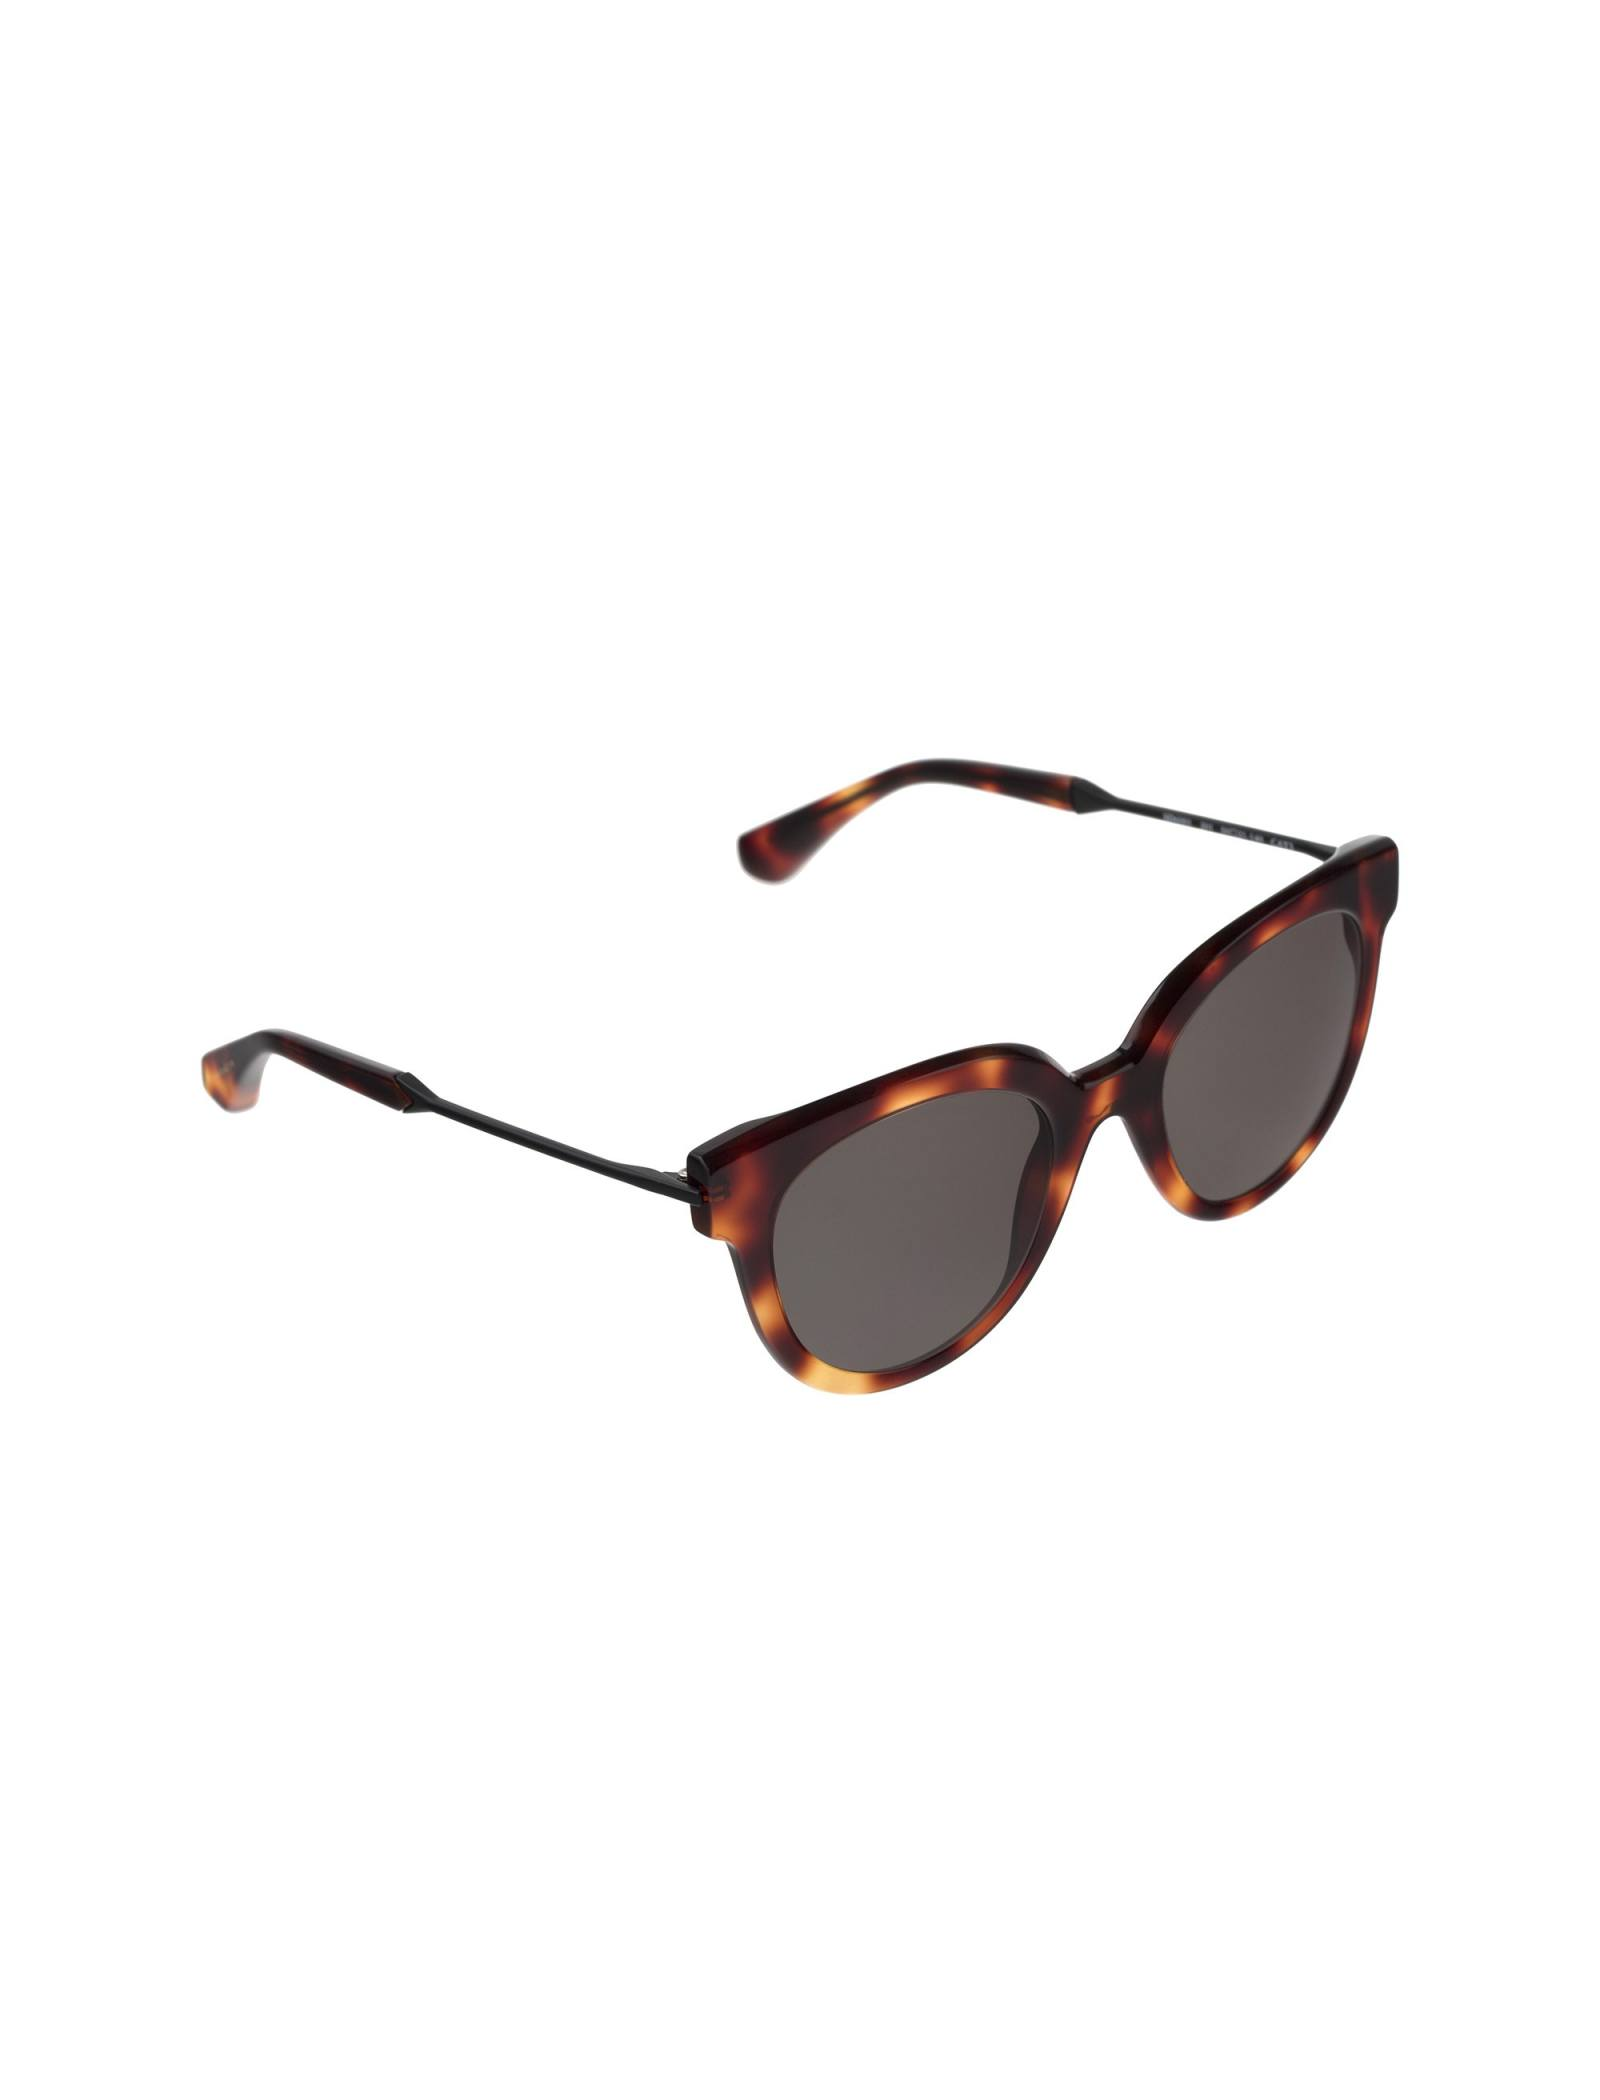 عینک آفتابی پنتوس زنانه - ساندرو - قهوه اي  - 2